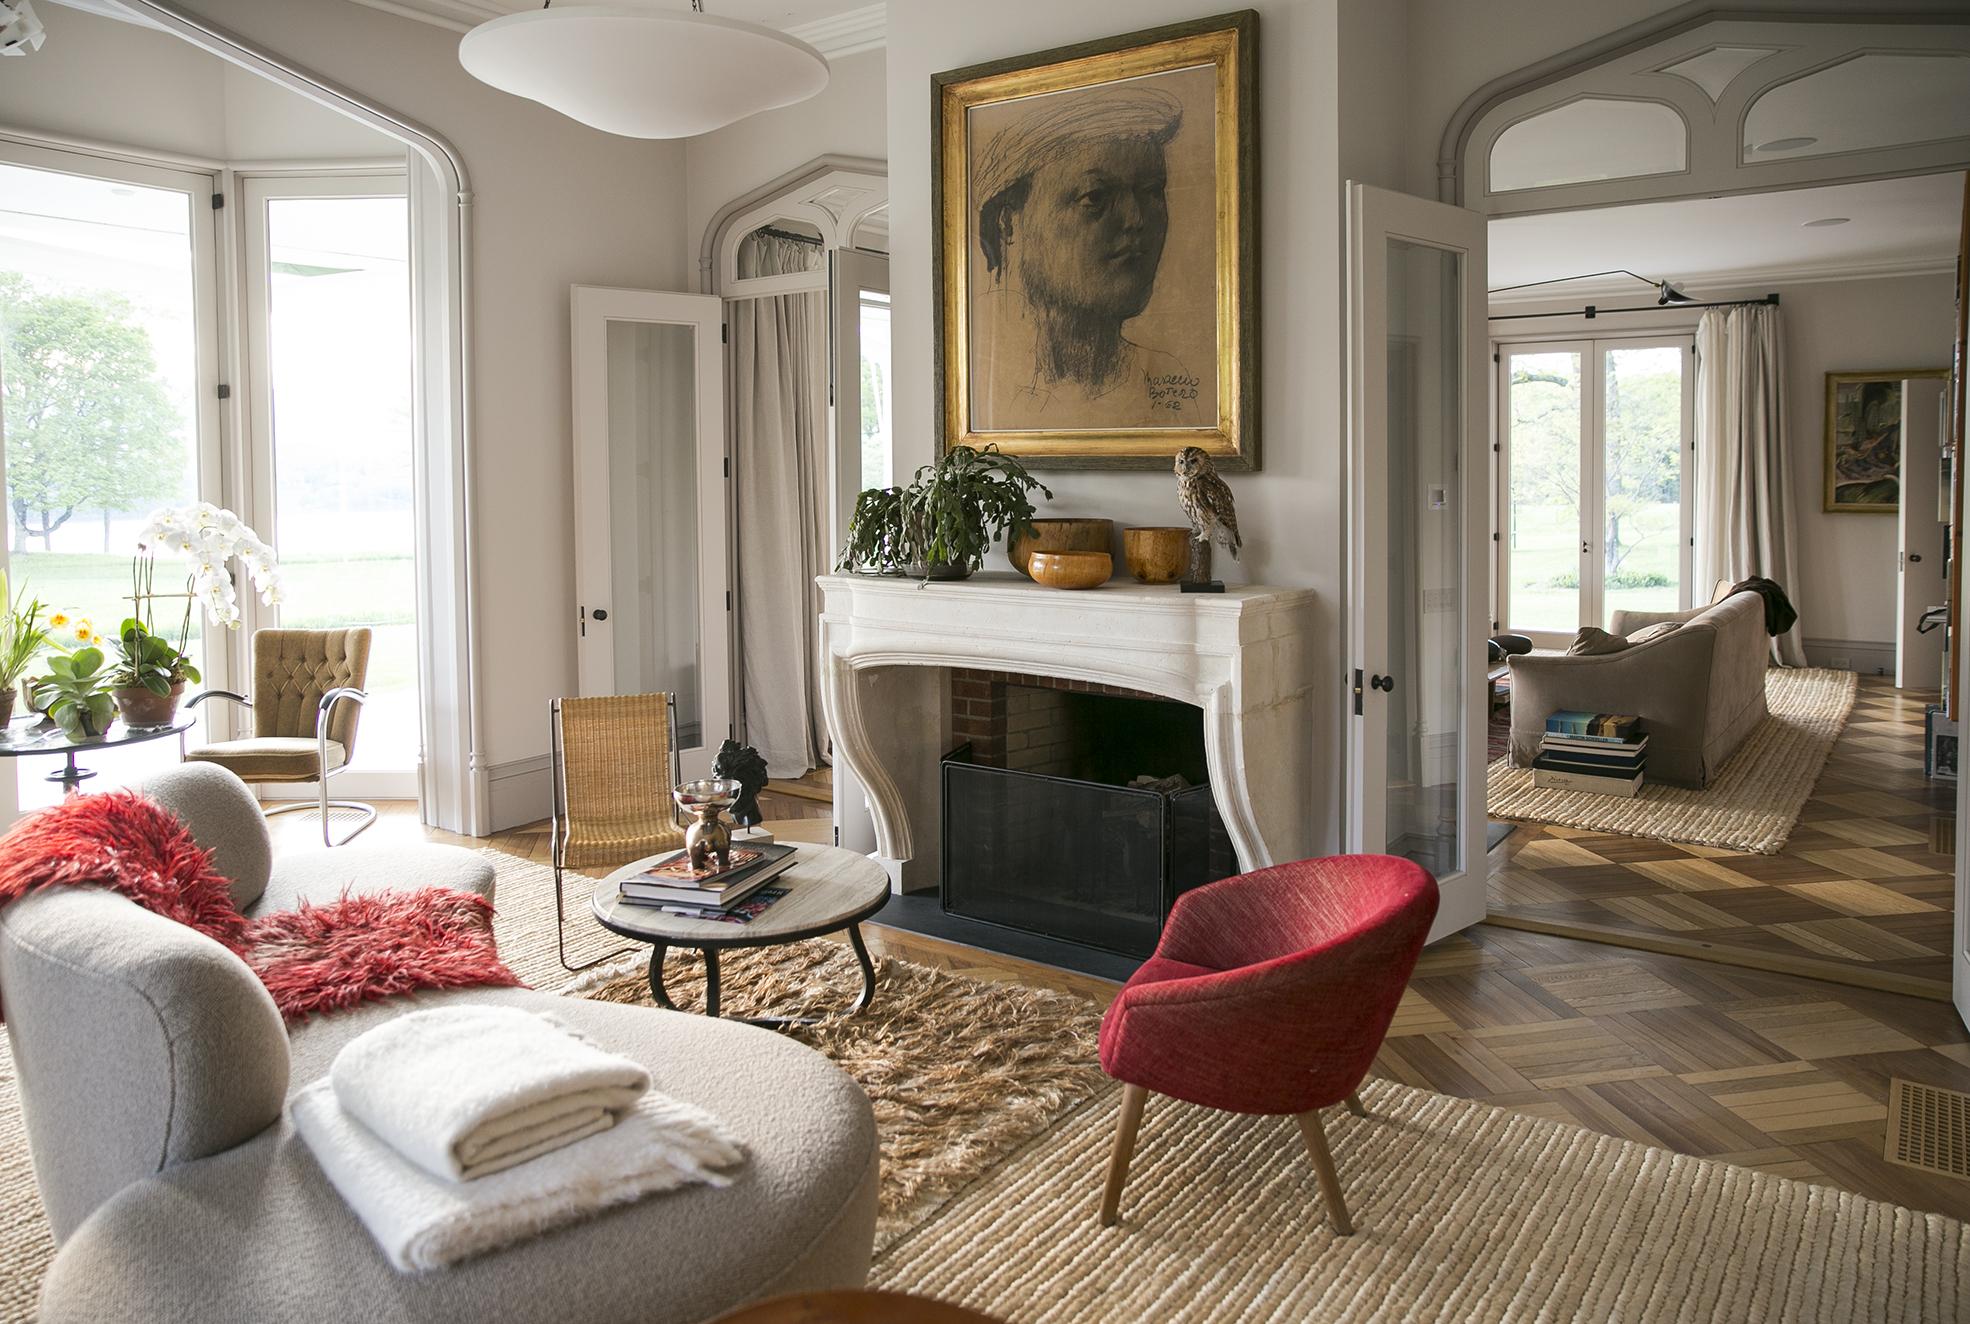 Teviot living room, small image.jpg